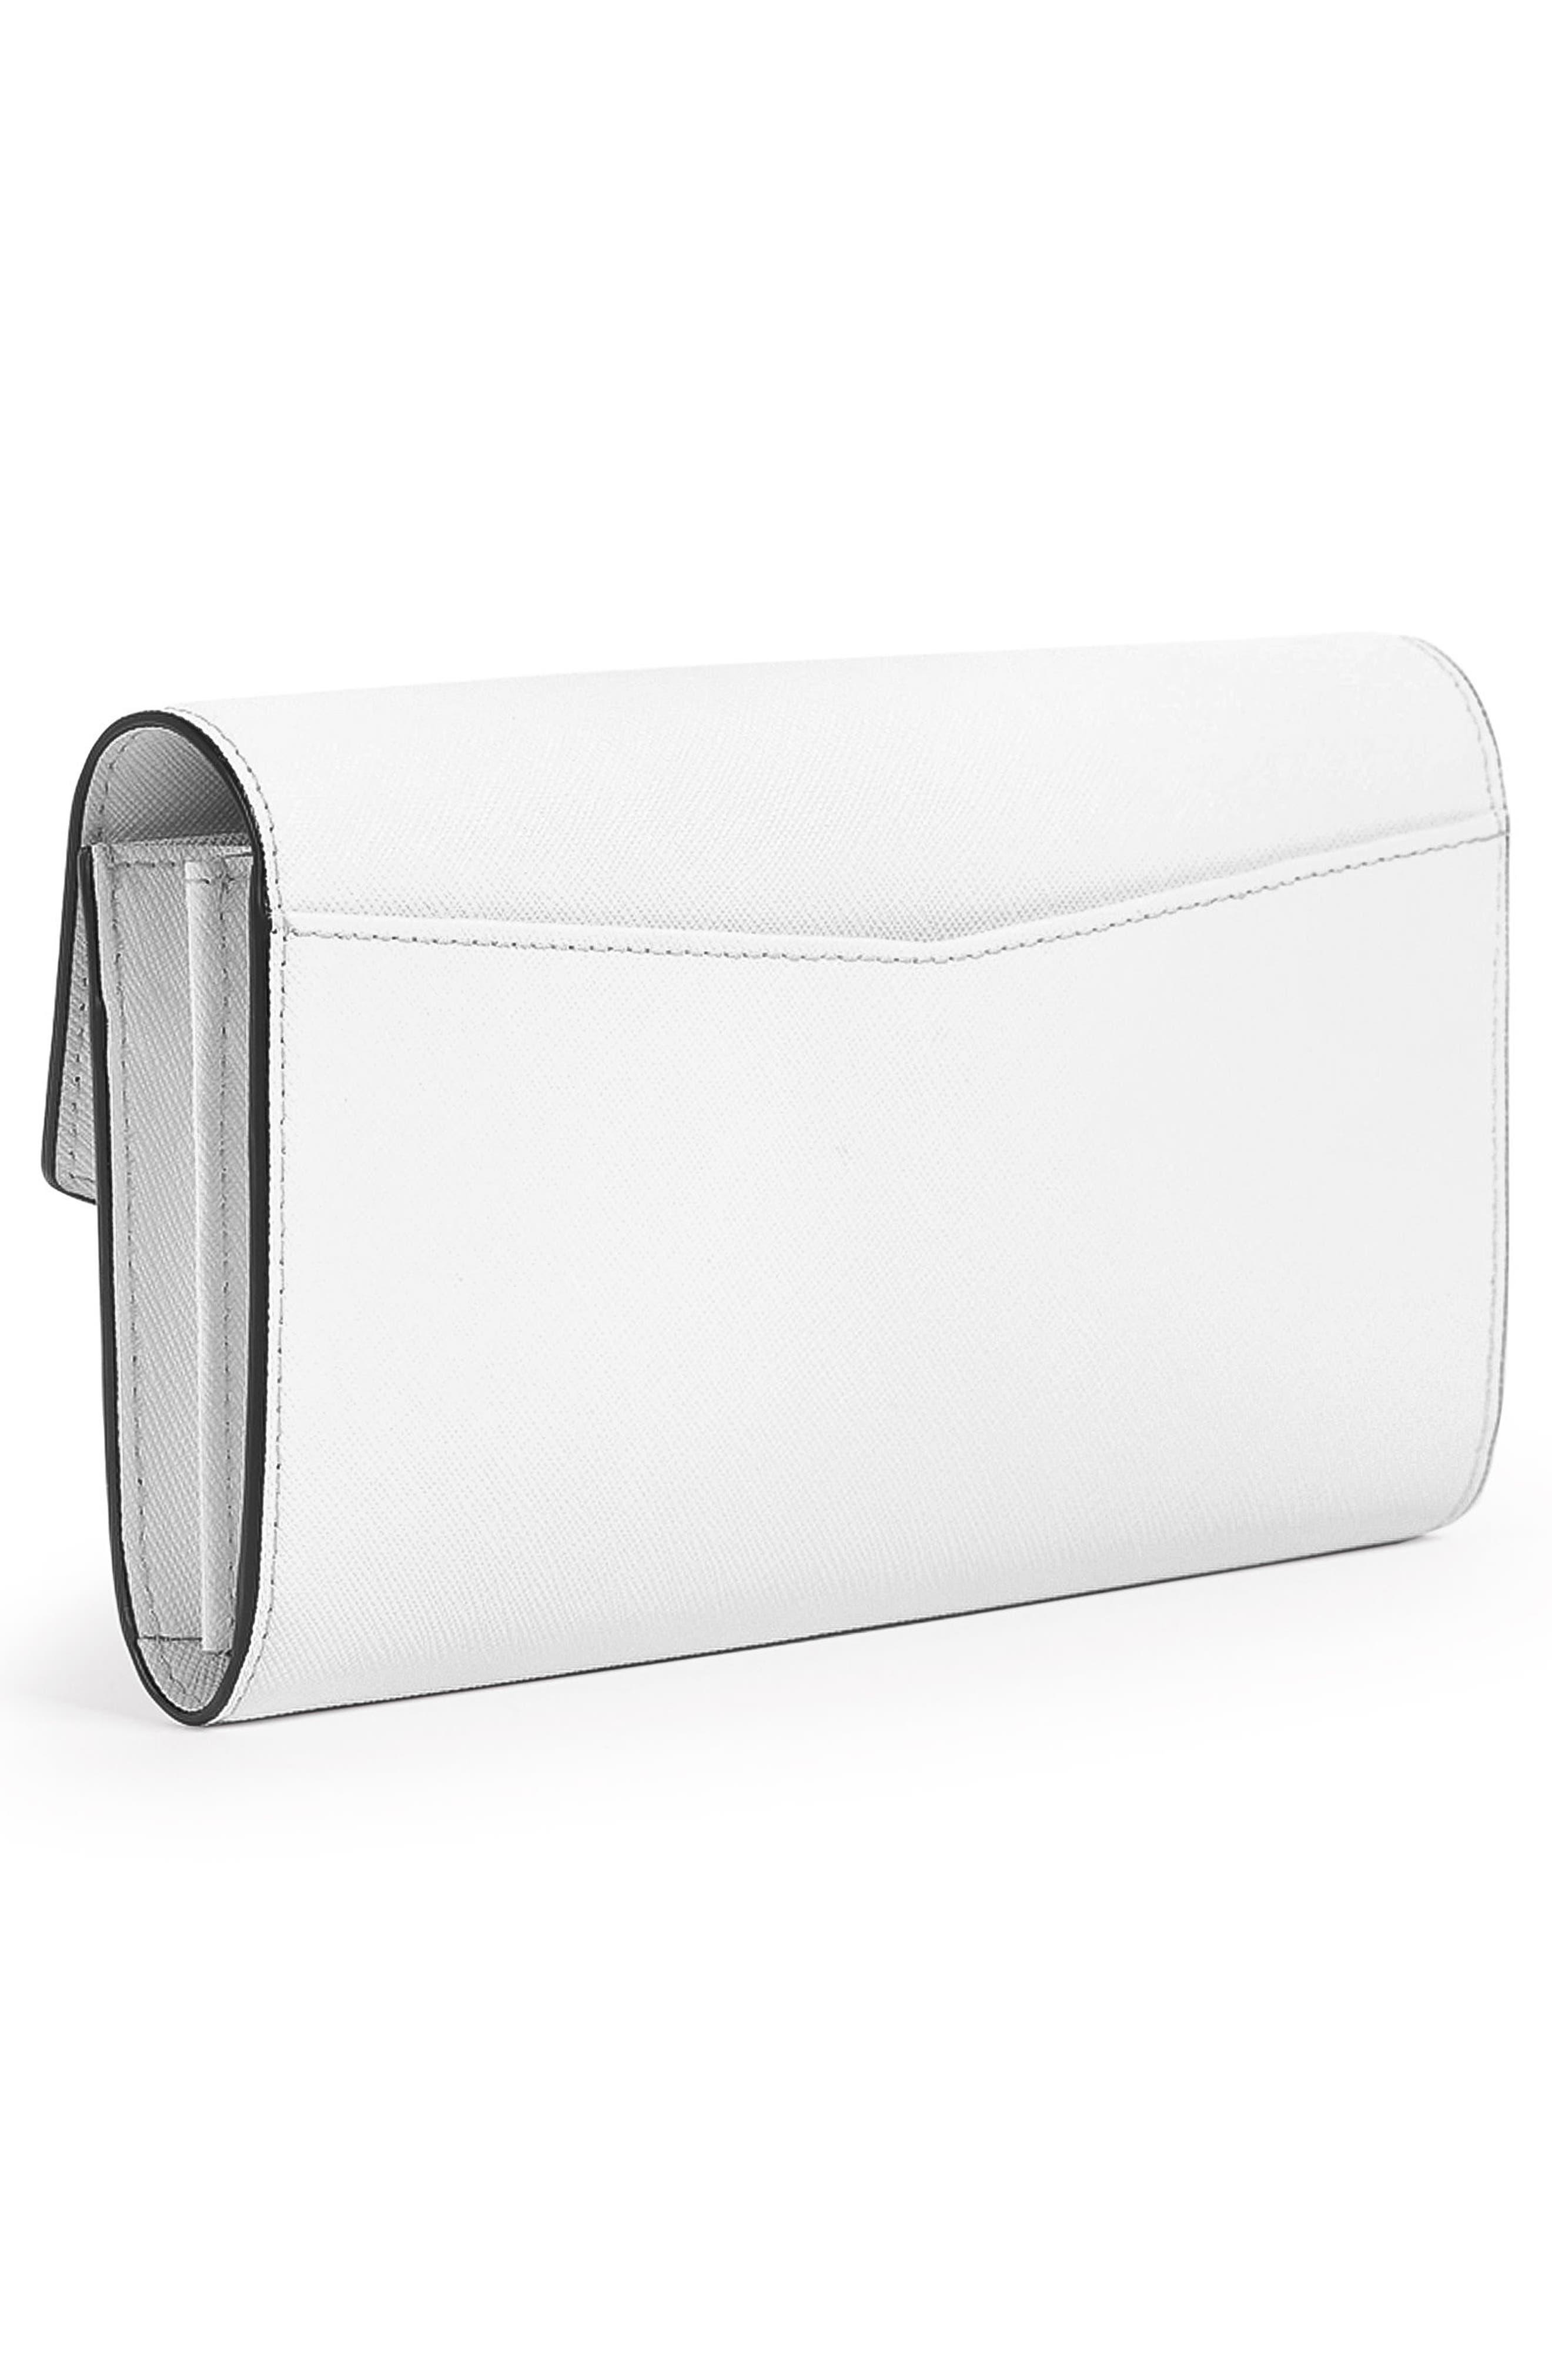 Alternate Image 3  - Botkier Cobble Hill Calfskin Leather Wallet